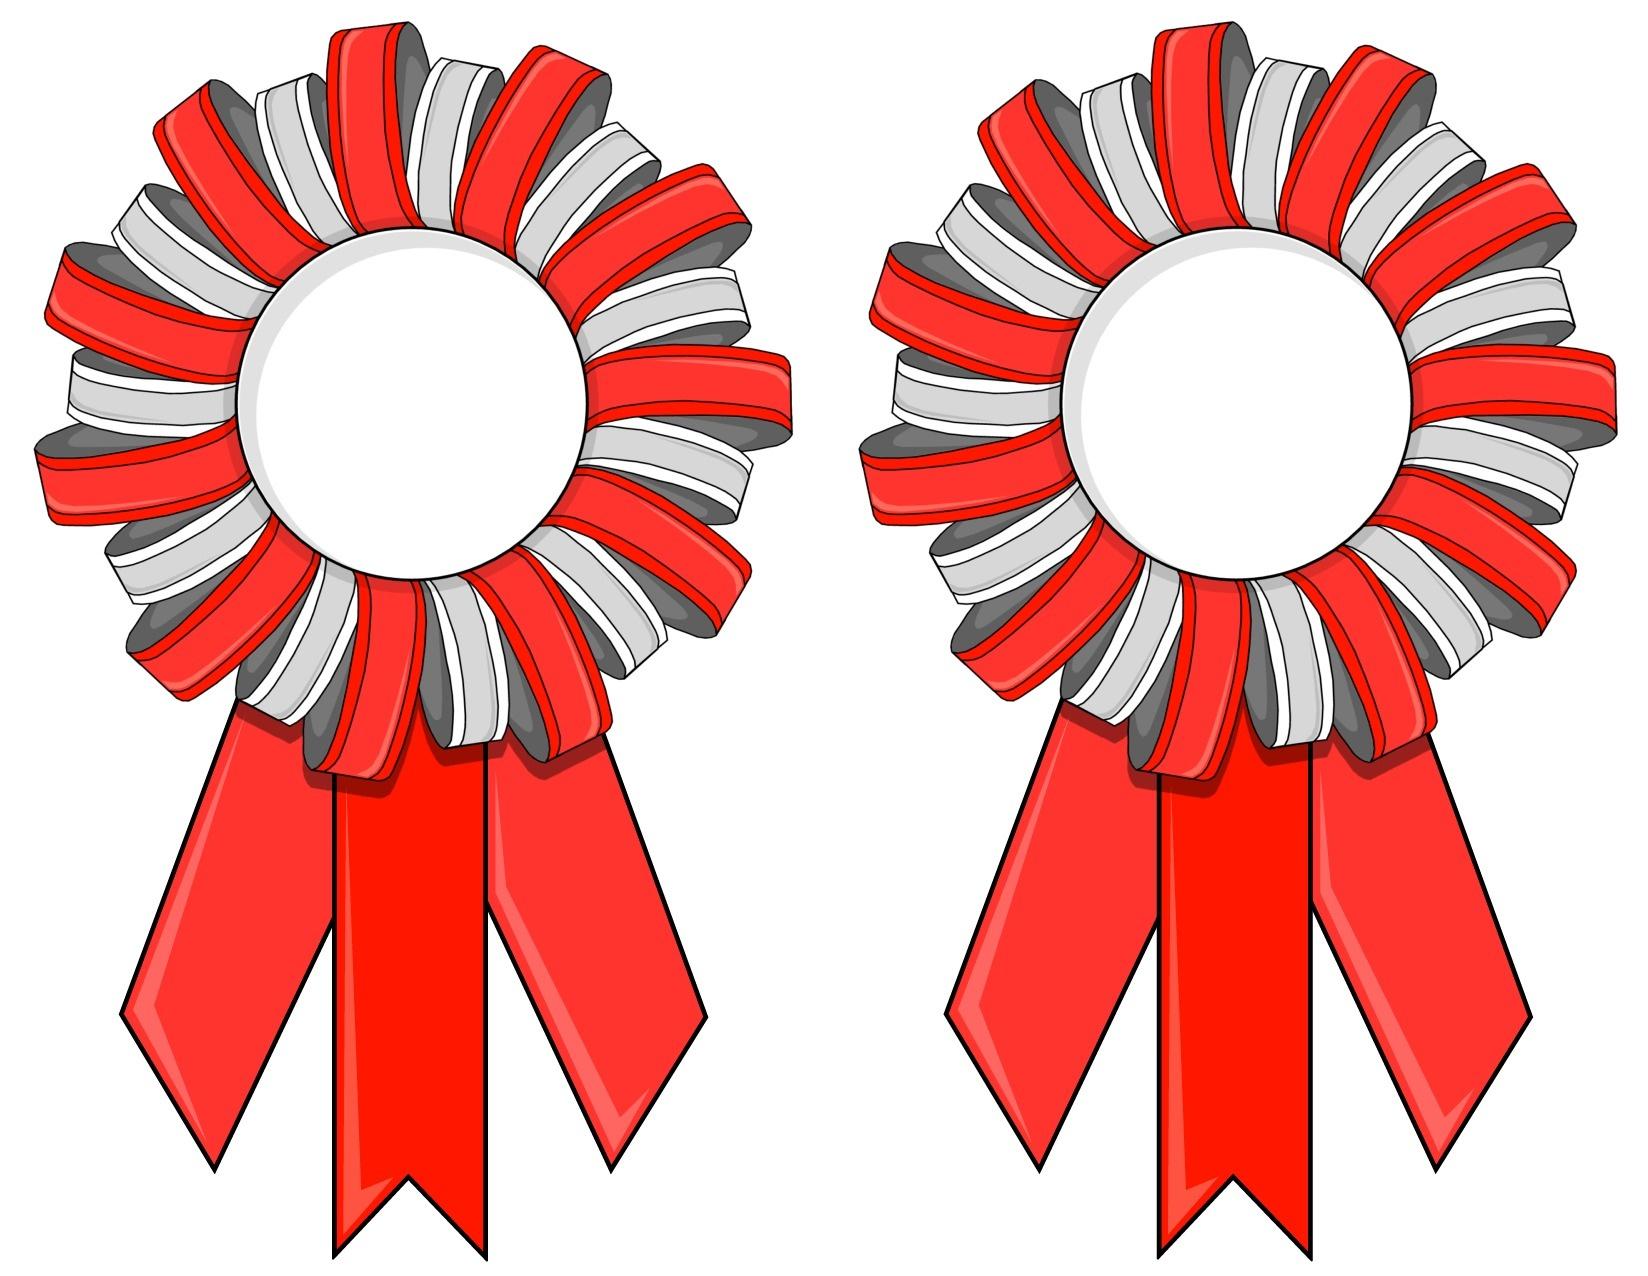 Printable Contest Ribbons Or Tournament Ribbons - Free Printable Ribbons